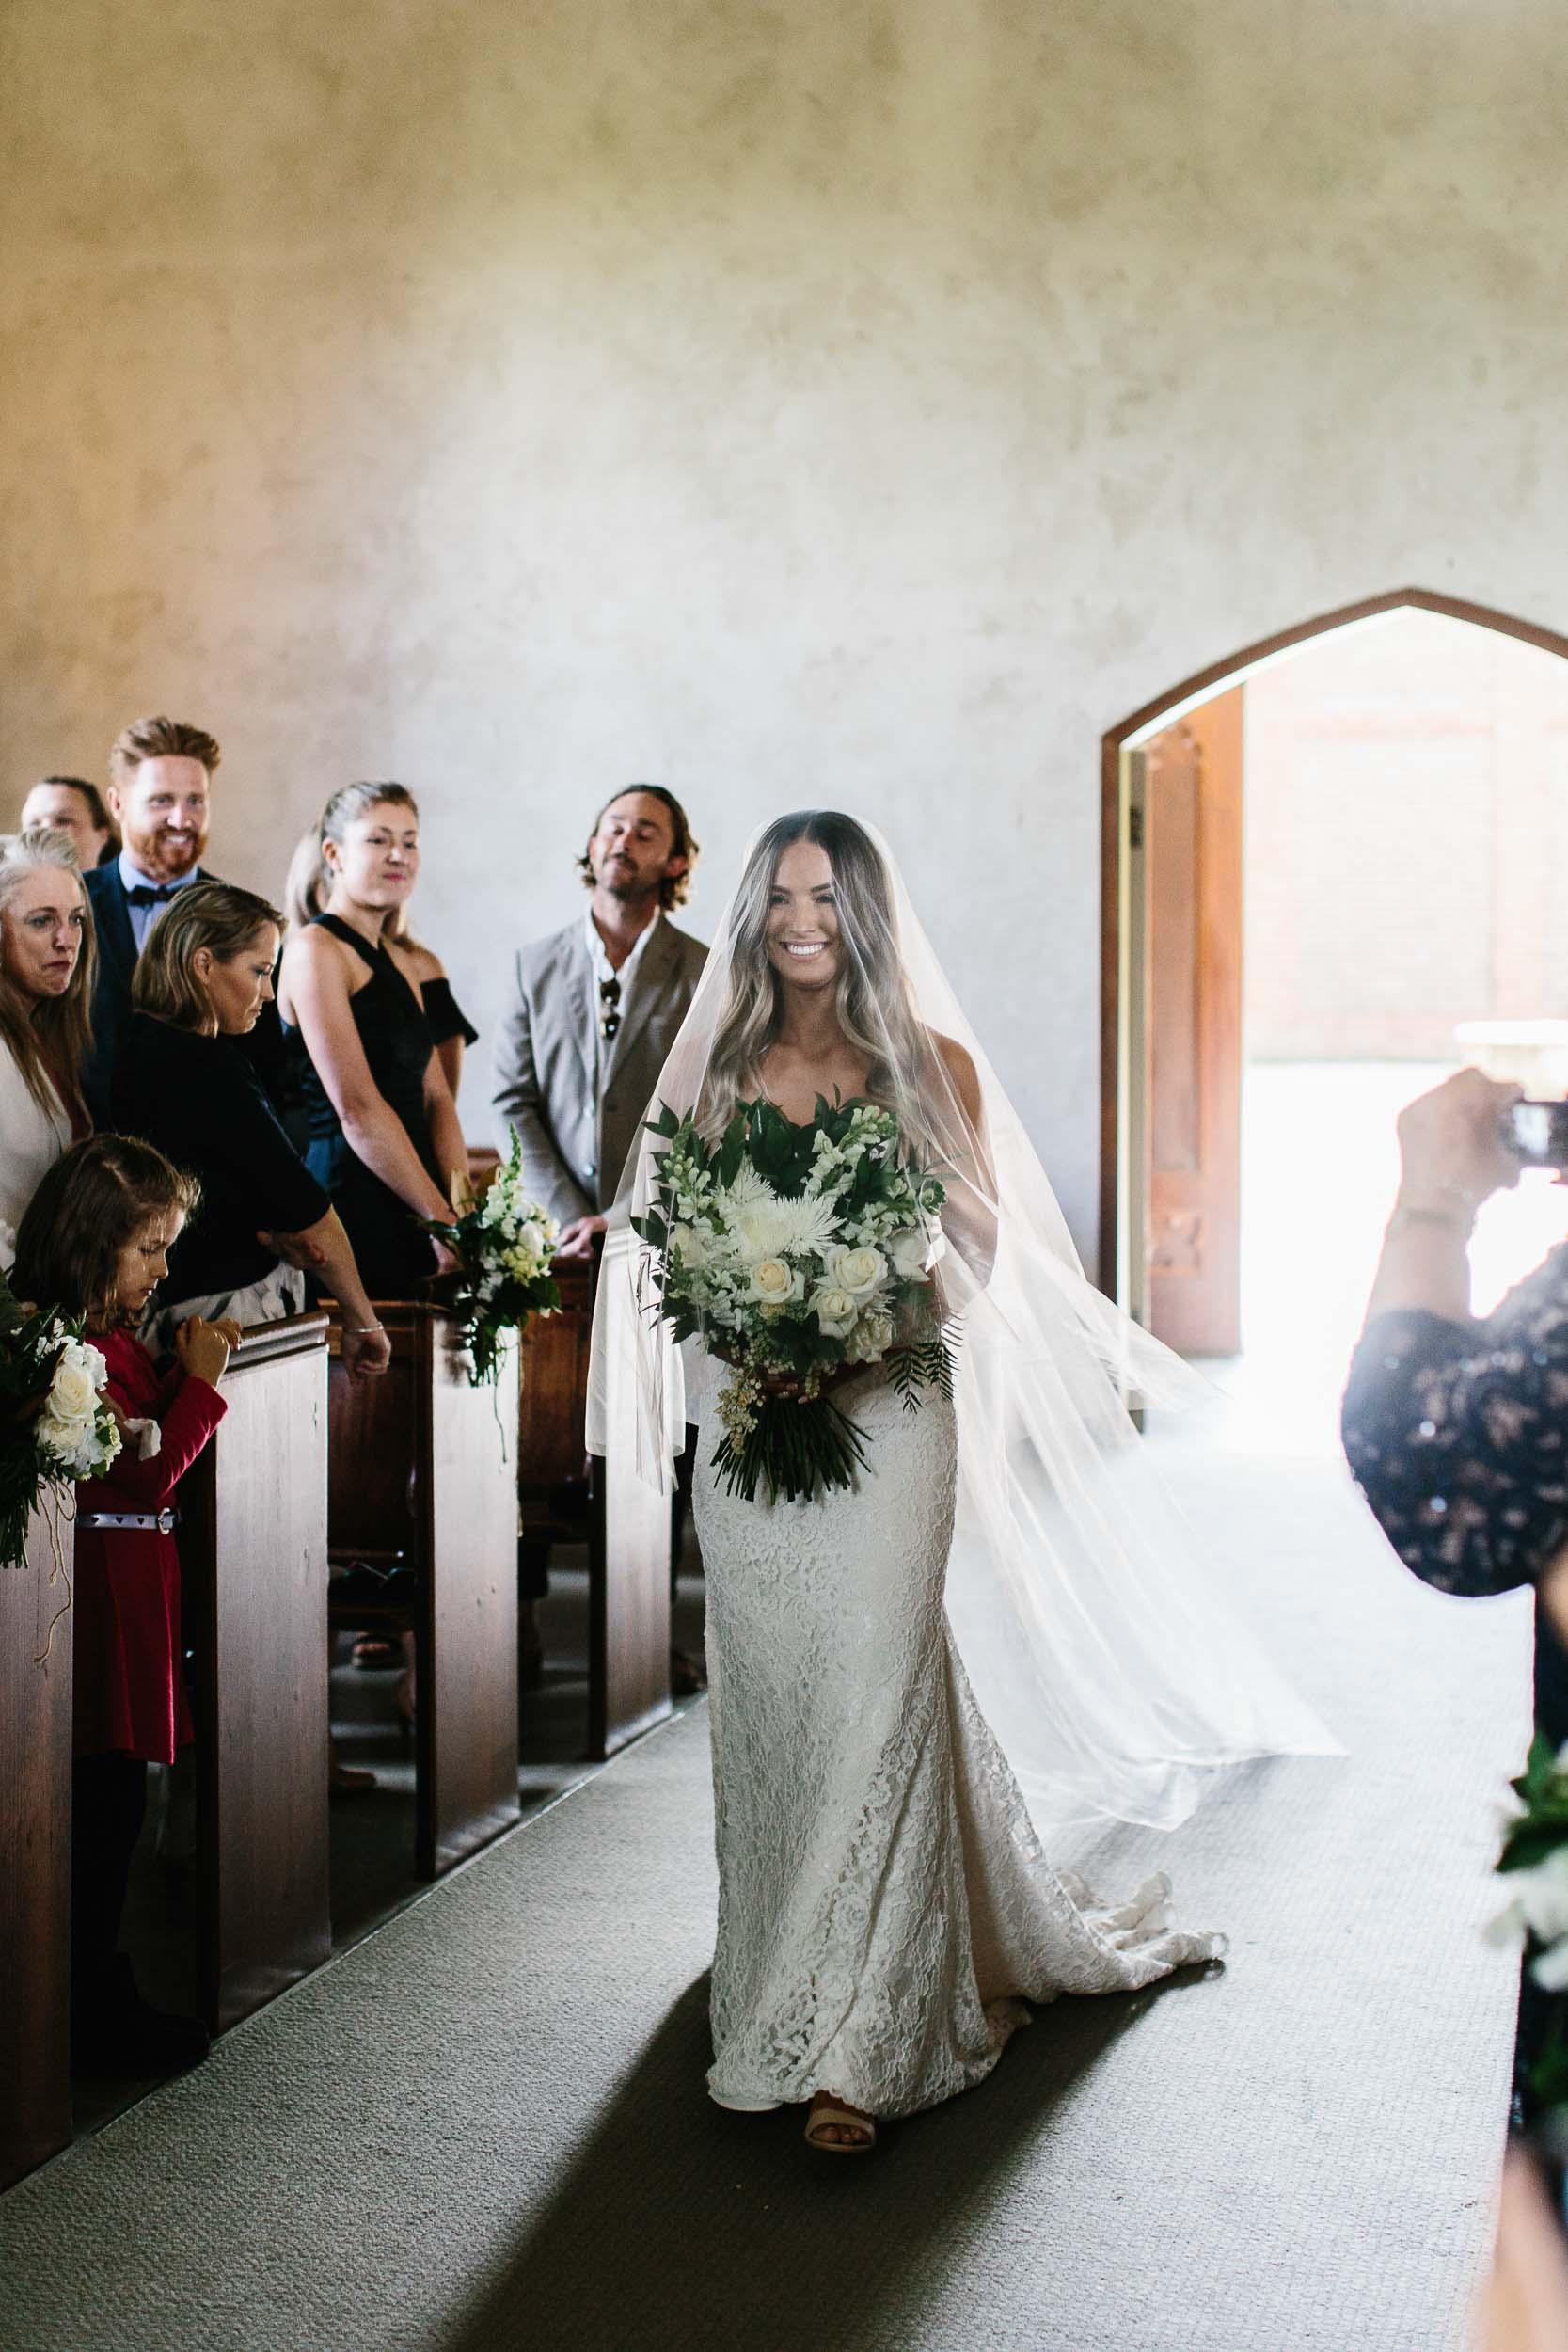 Kas-Richards-Stones-of-the-Yarra-Valley-Wedding-314.jpg